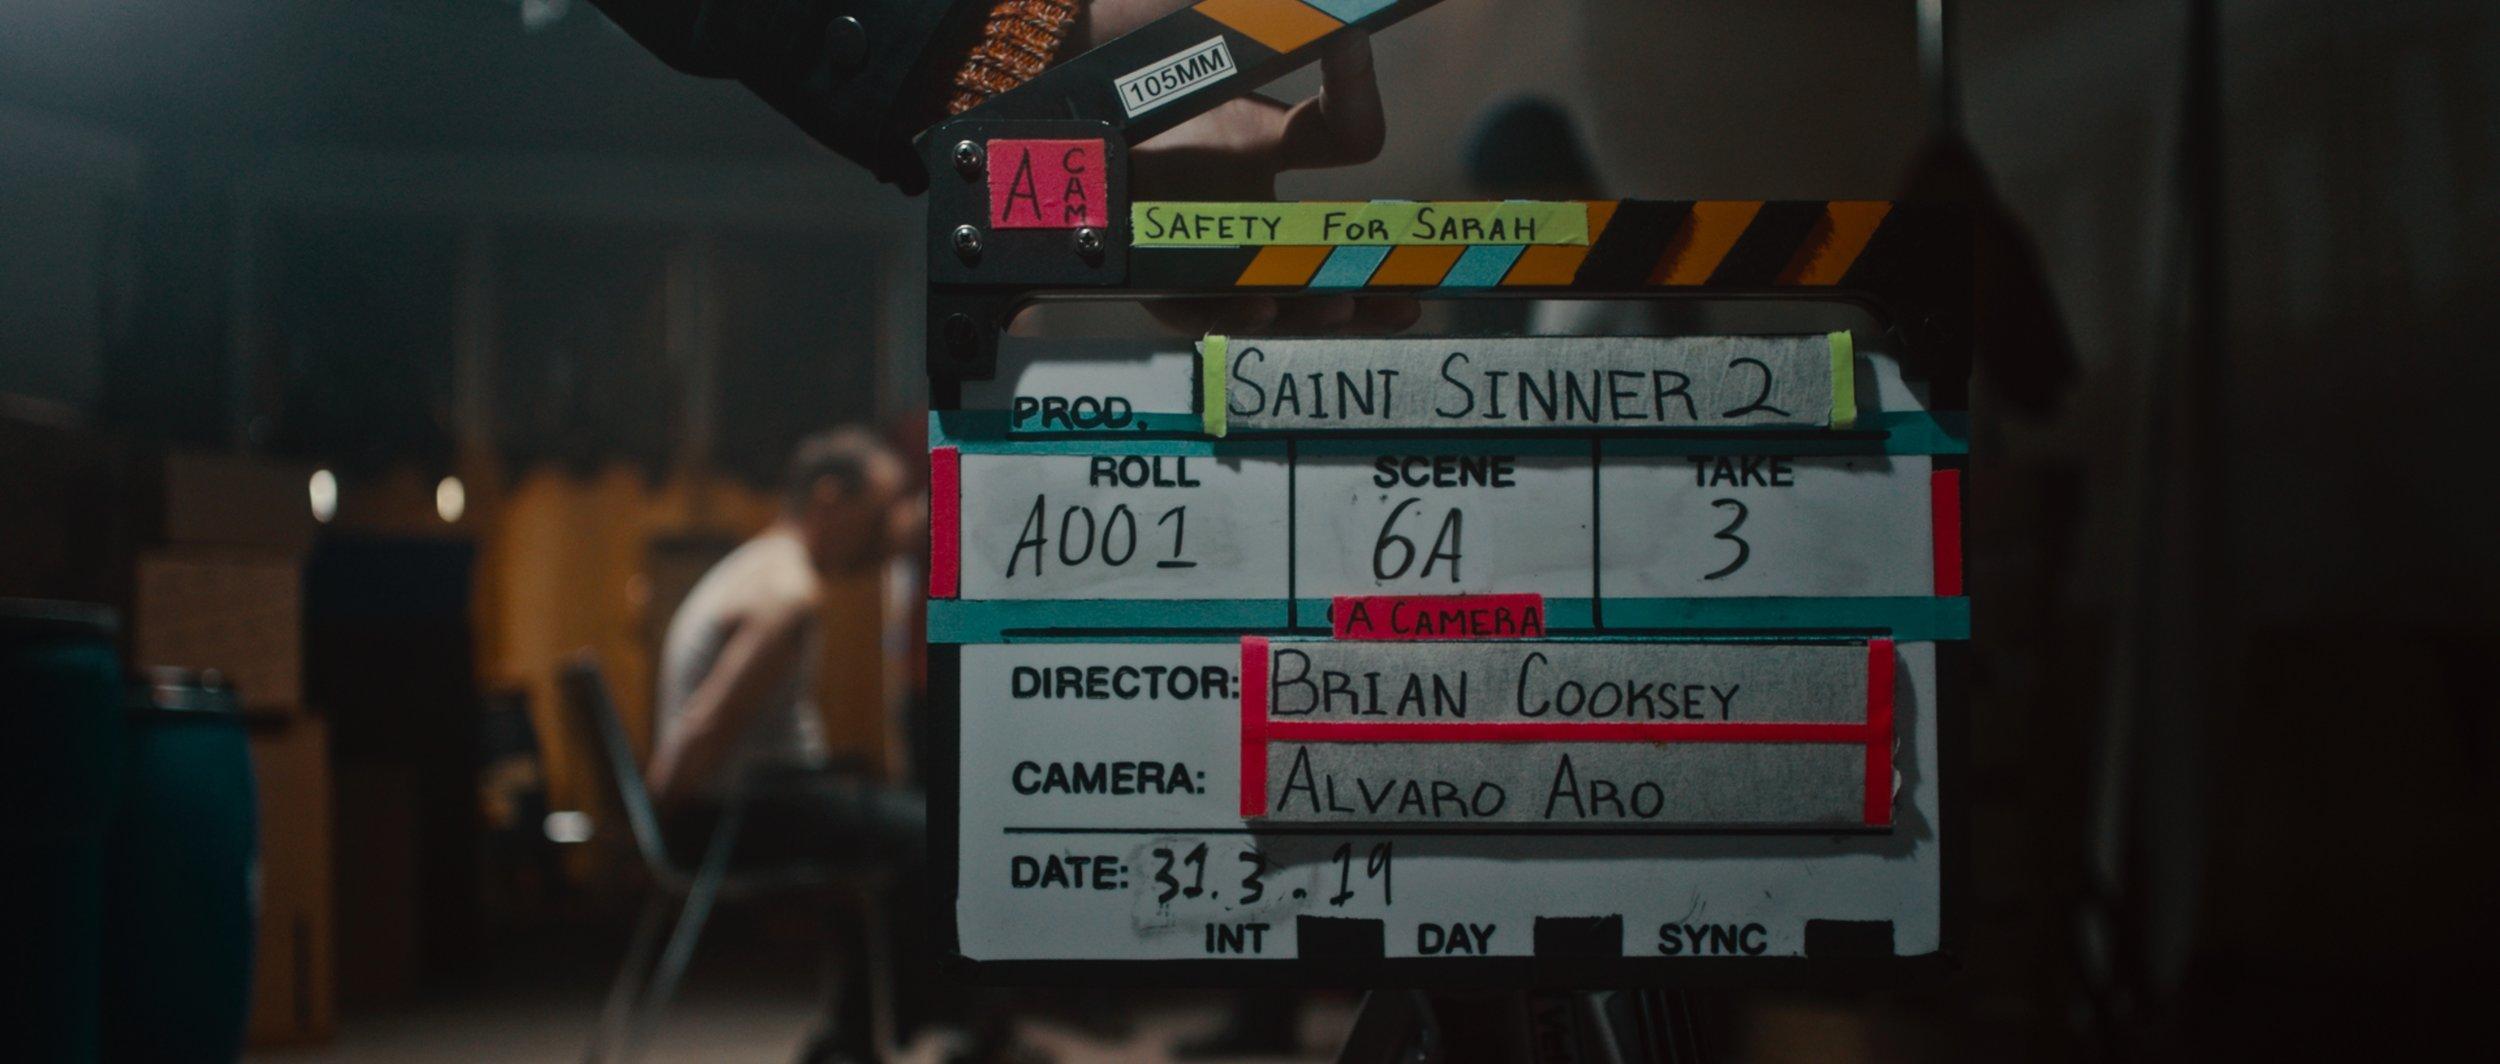 Saint_Sinner3.JPG